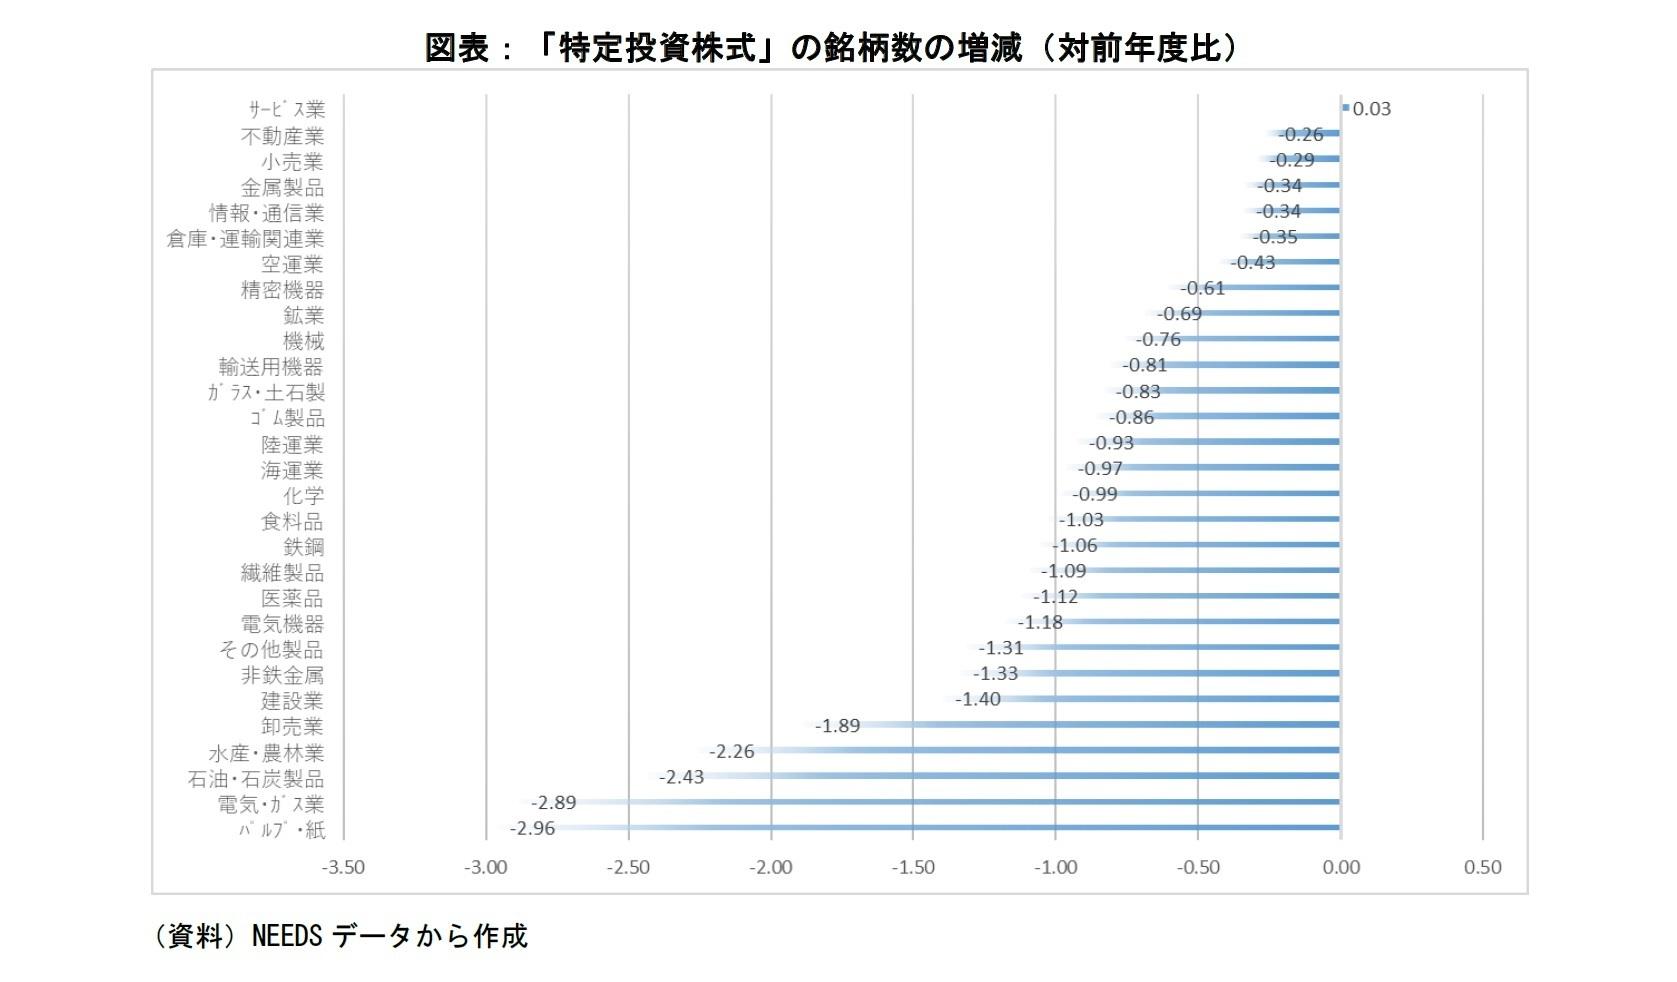 図表:「特定投資株式」の銘柄数の増減(対前年比)